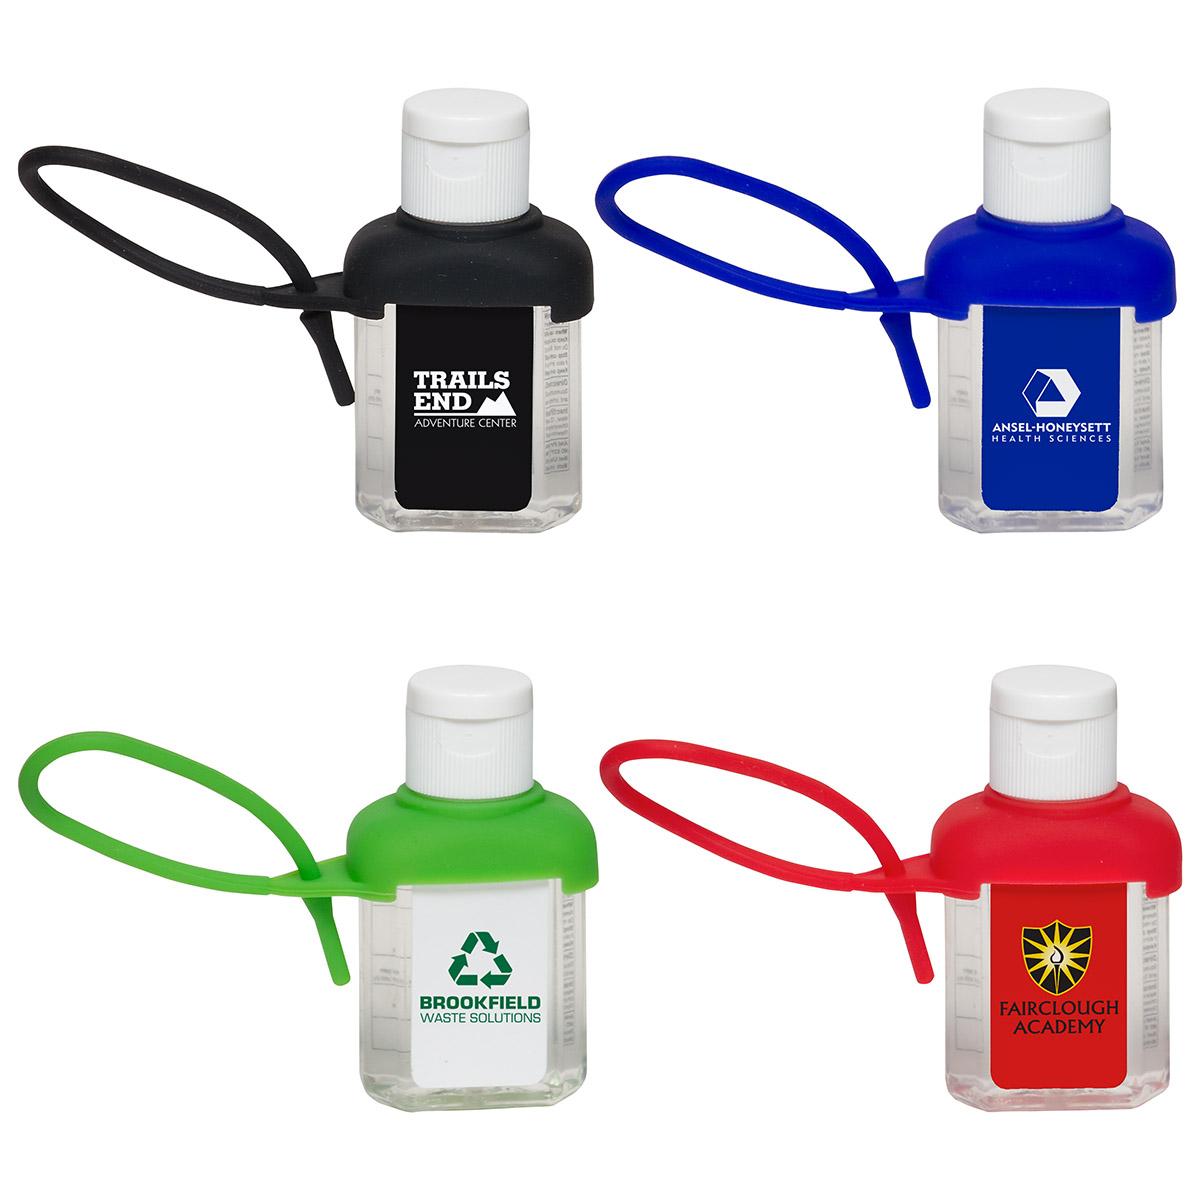 1 Oz. Caddy Strap Alcohol Free Hand Sanitizer, WSA-CA16 - 1 Colour Imprint